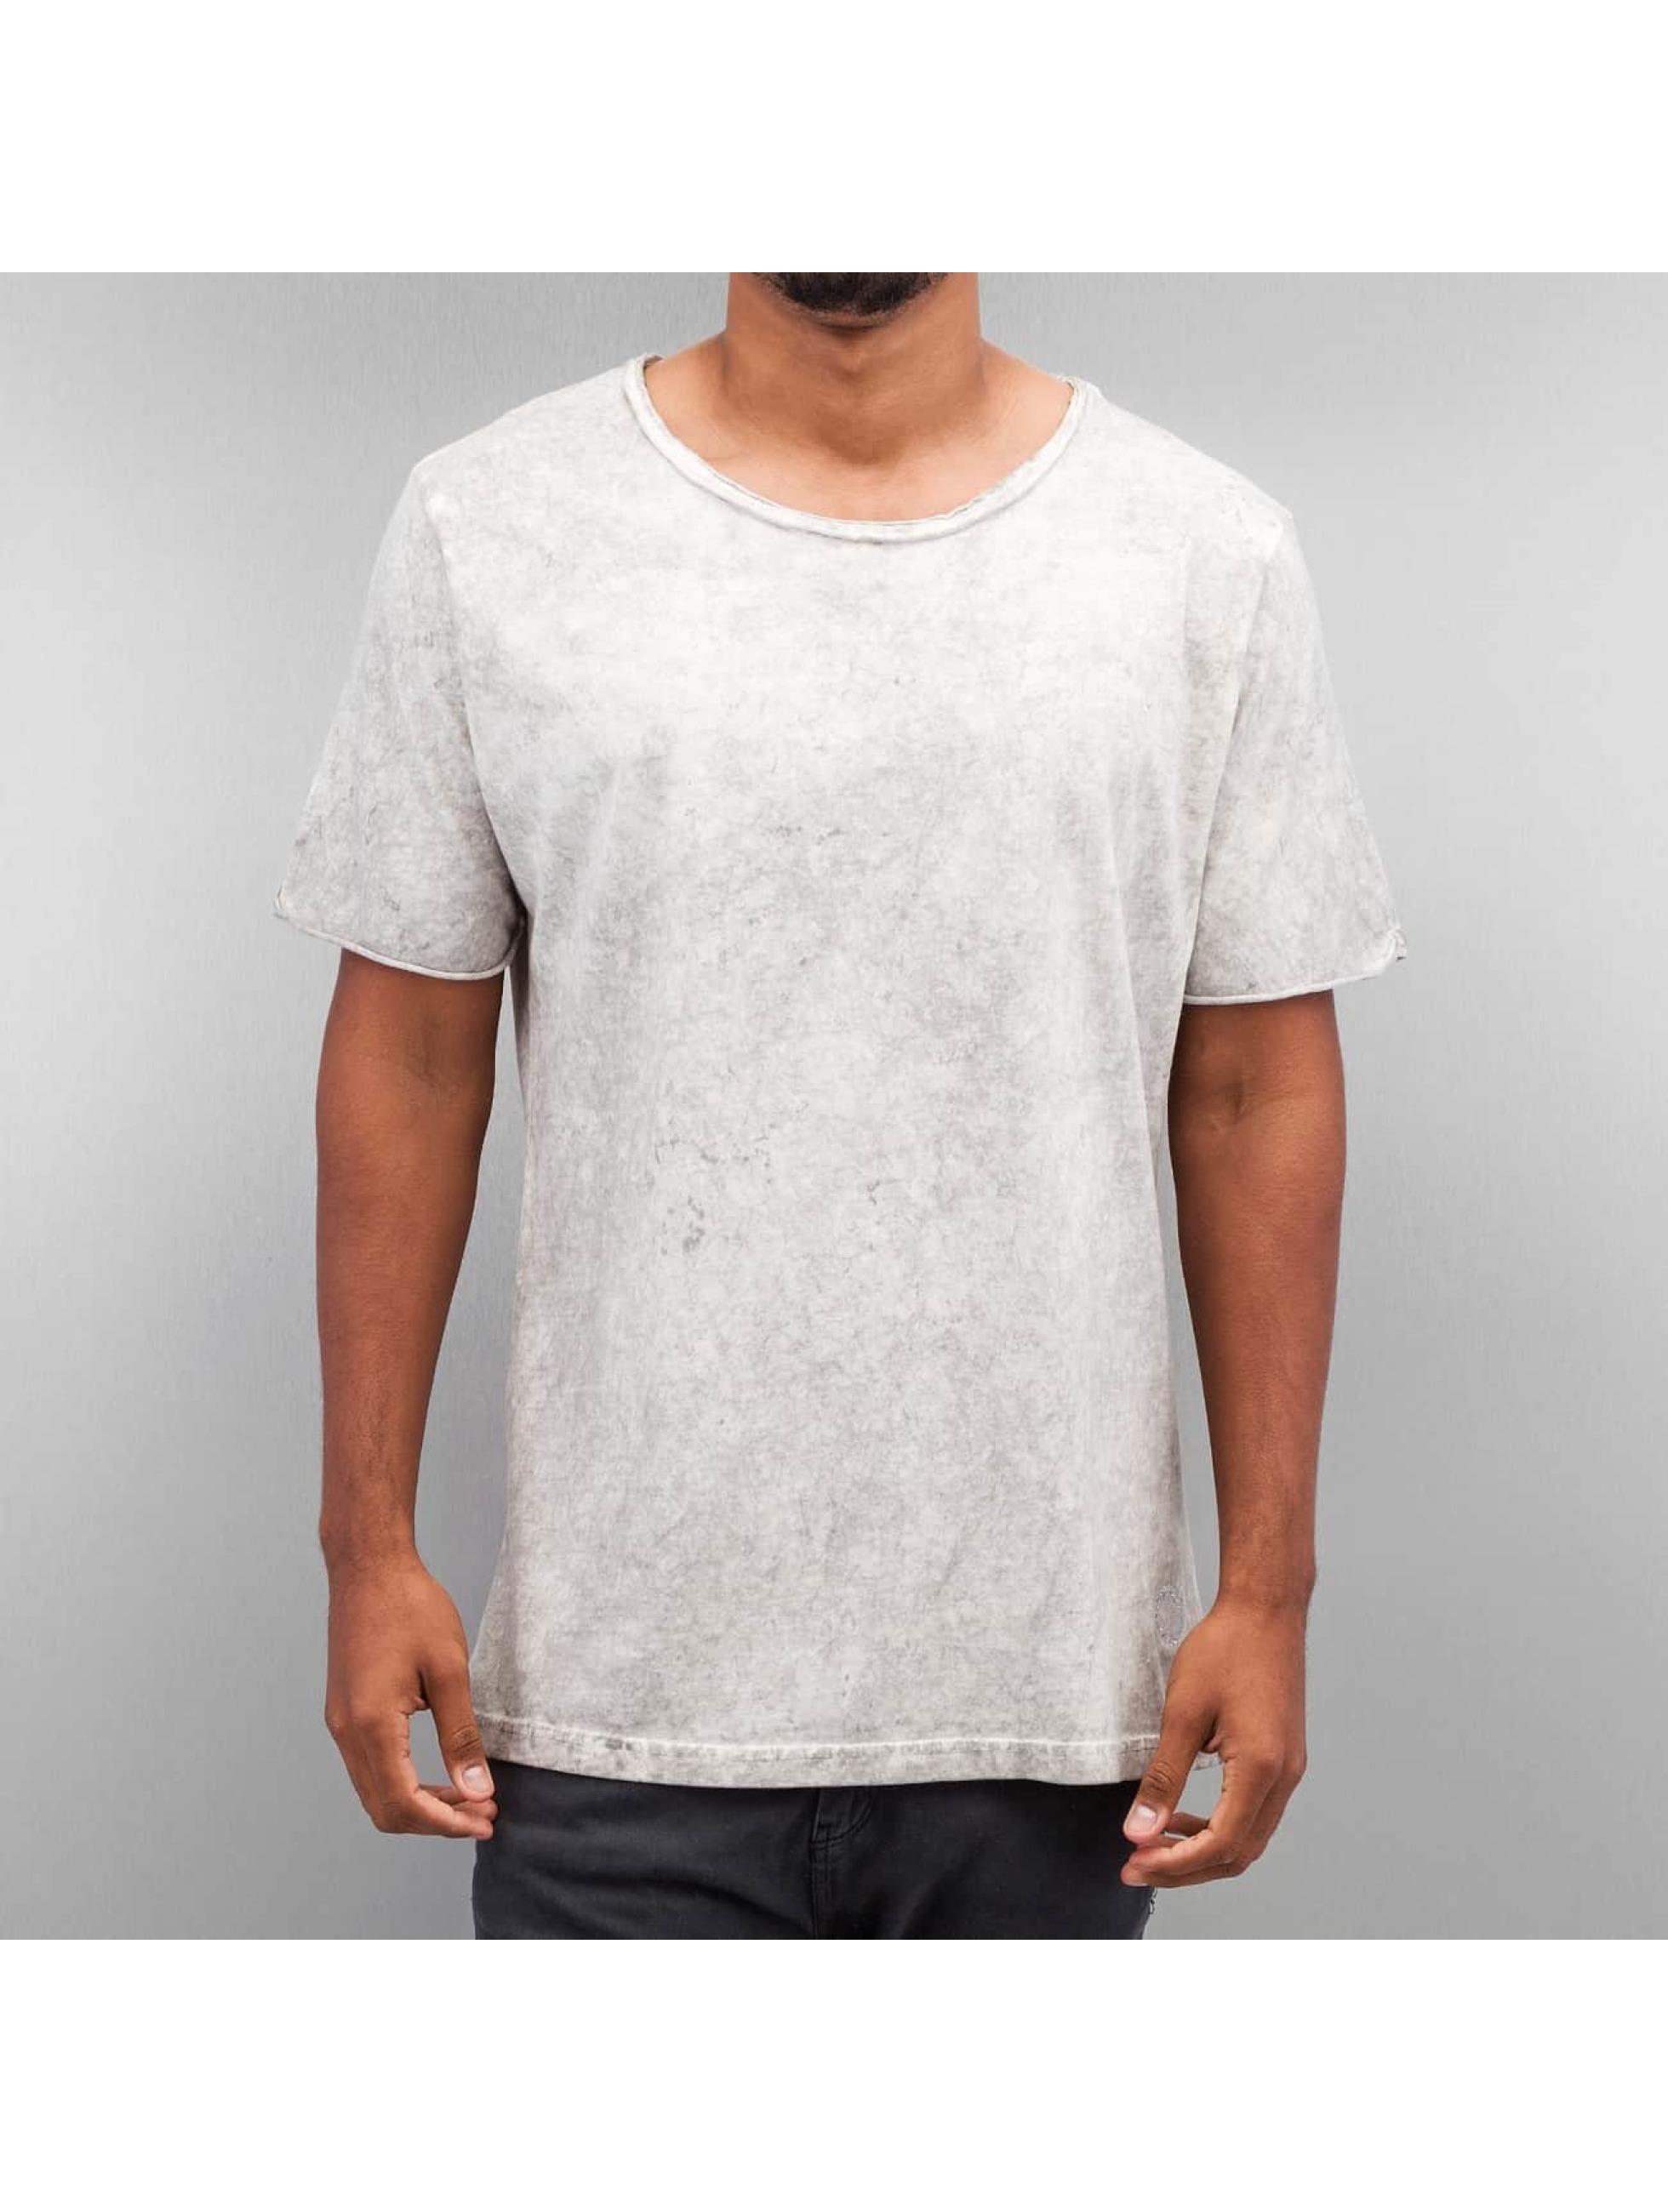 Yezz Männer T-Shirt Marble in grau